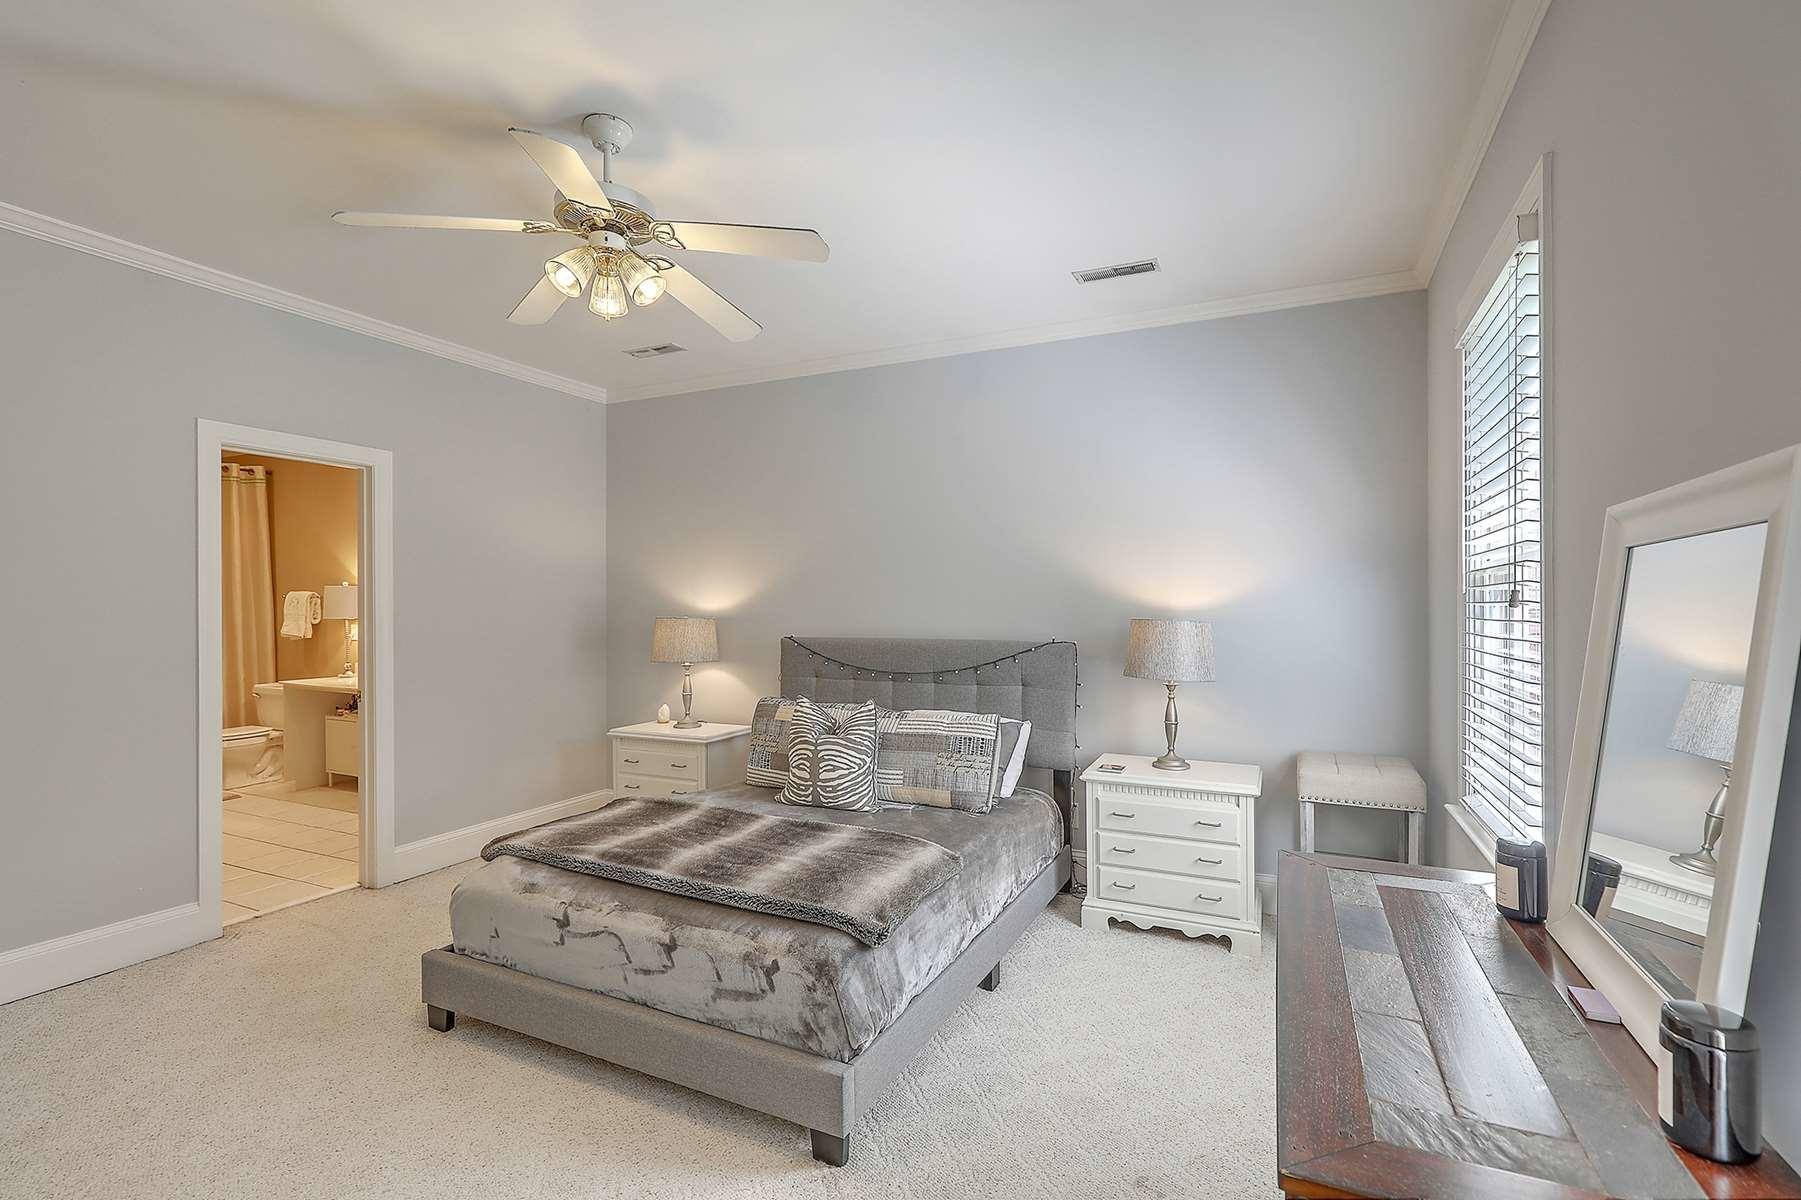 Dunes West Homes For Sale - 2961 Pignatelli, Mount Pleasant, SC - 44